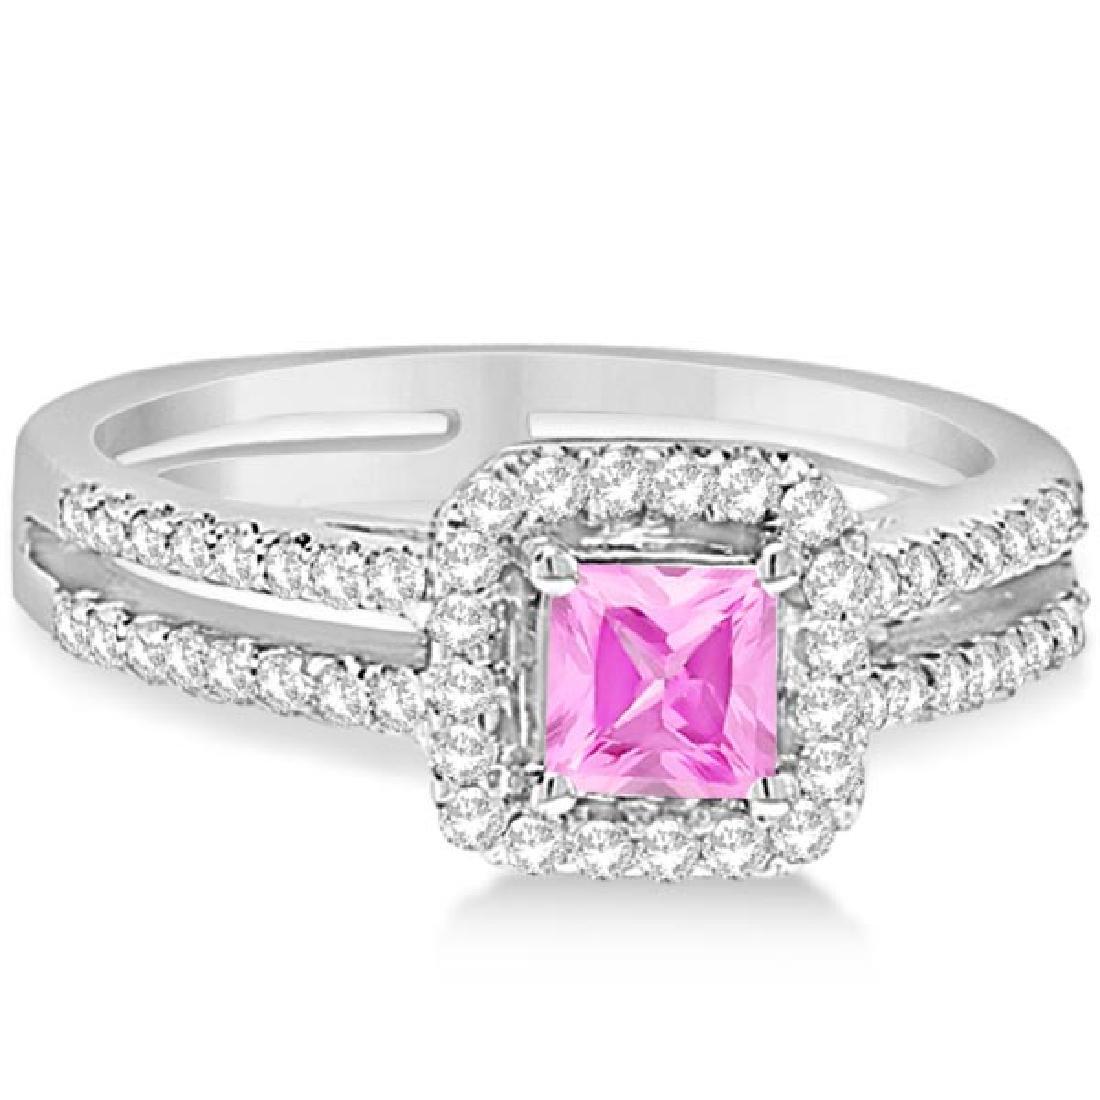 Enhanced Pink Diamond Engagement Ring Split Shank 18K W